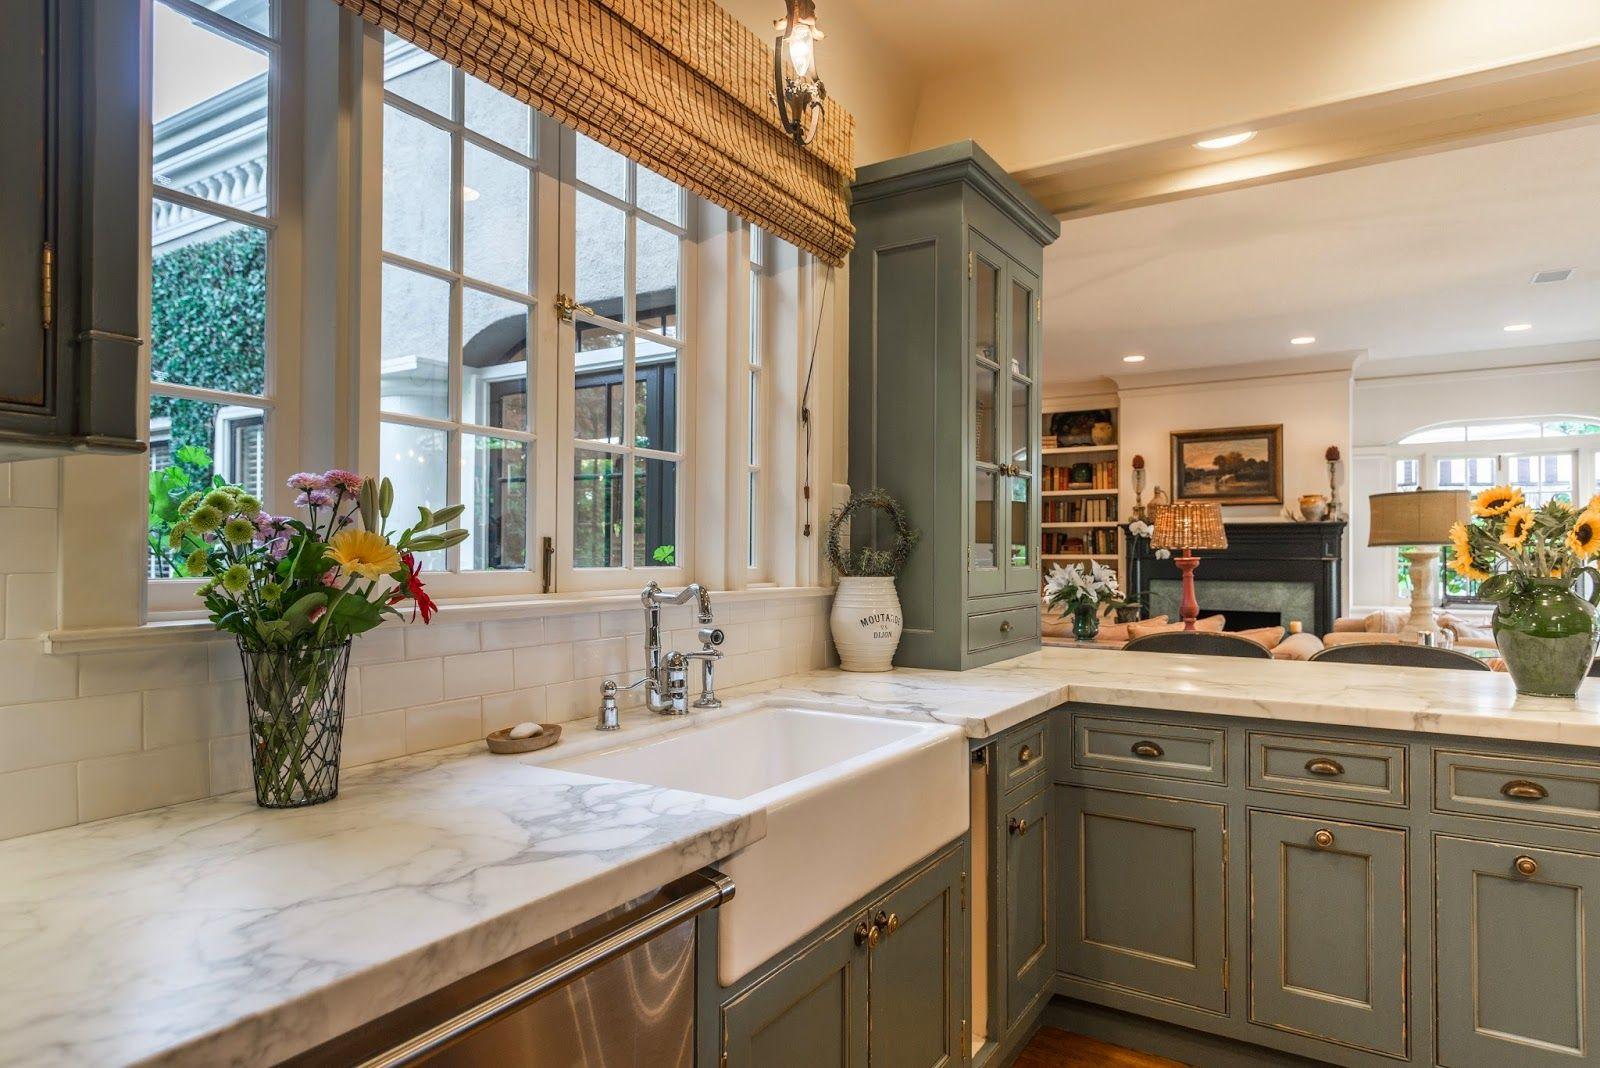 Vignette design the virtual tour kitchen ideas for the for Kitchen design virtual